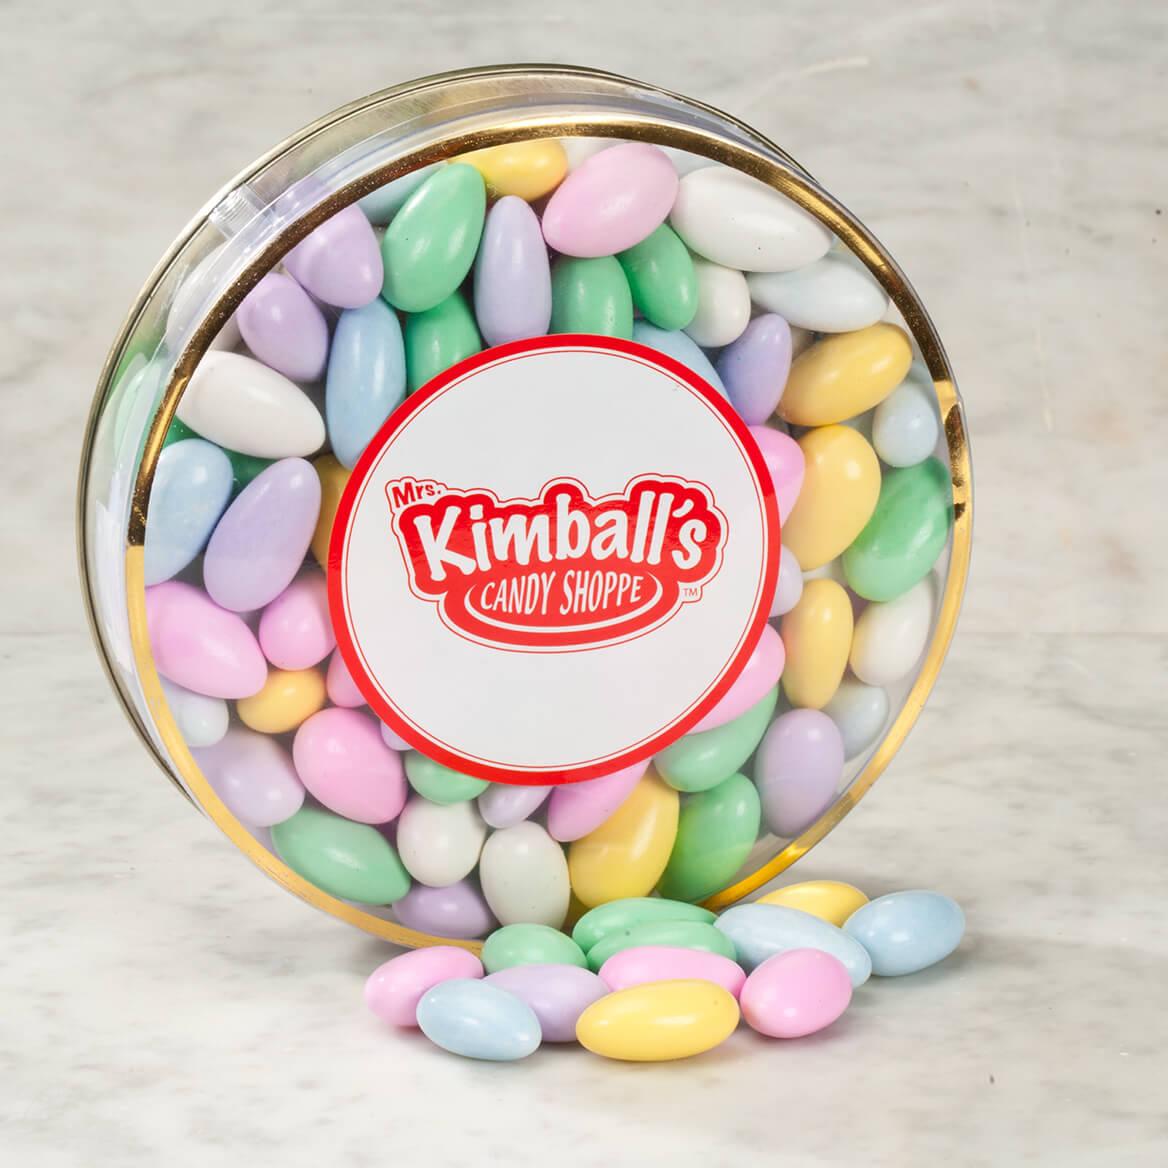 Mini Jordan Almonds Gift Tray by Mrs. Kimball's Candy Shoppe-360450